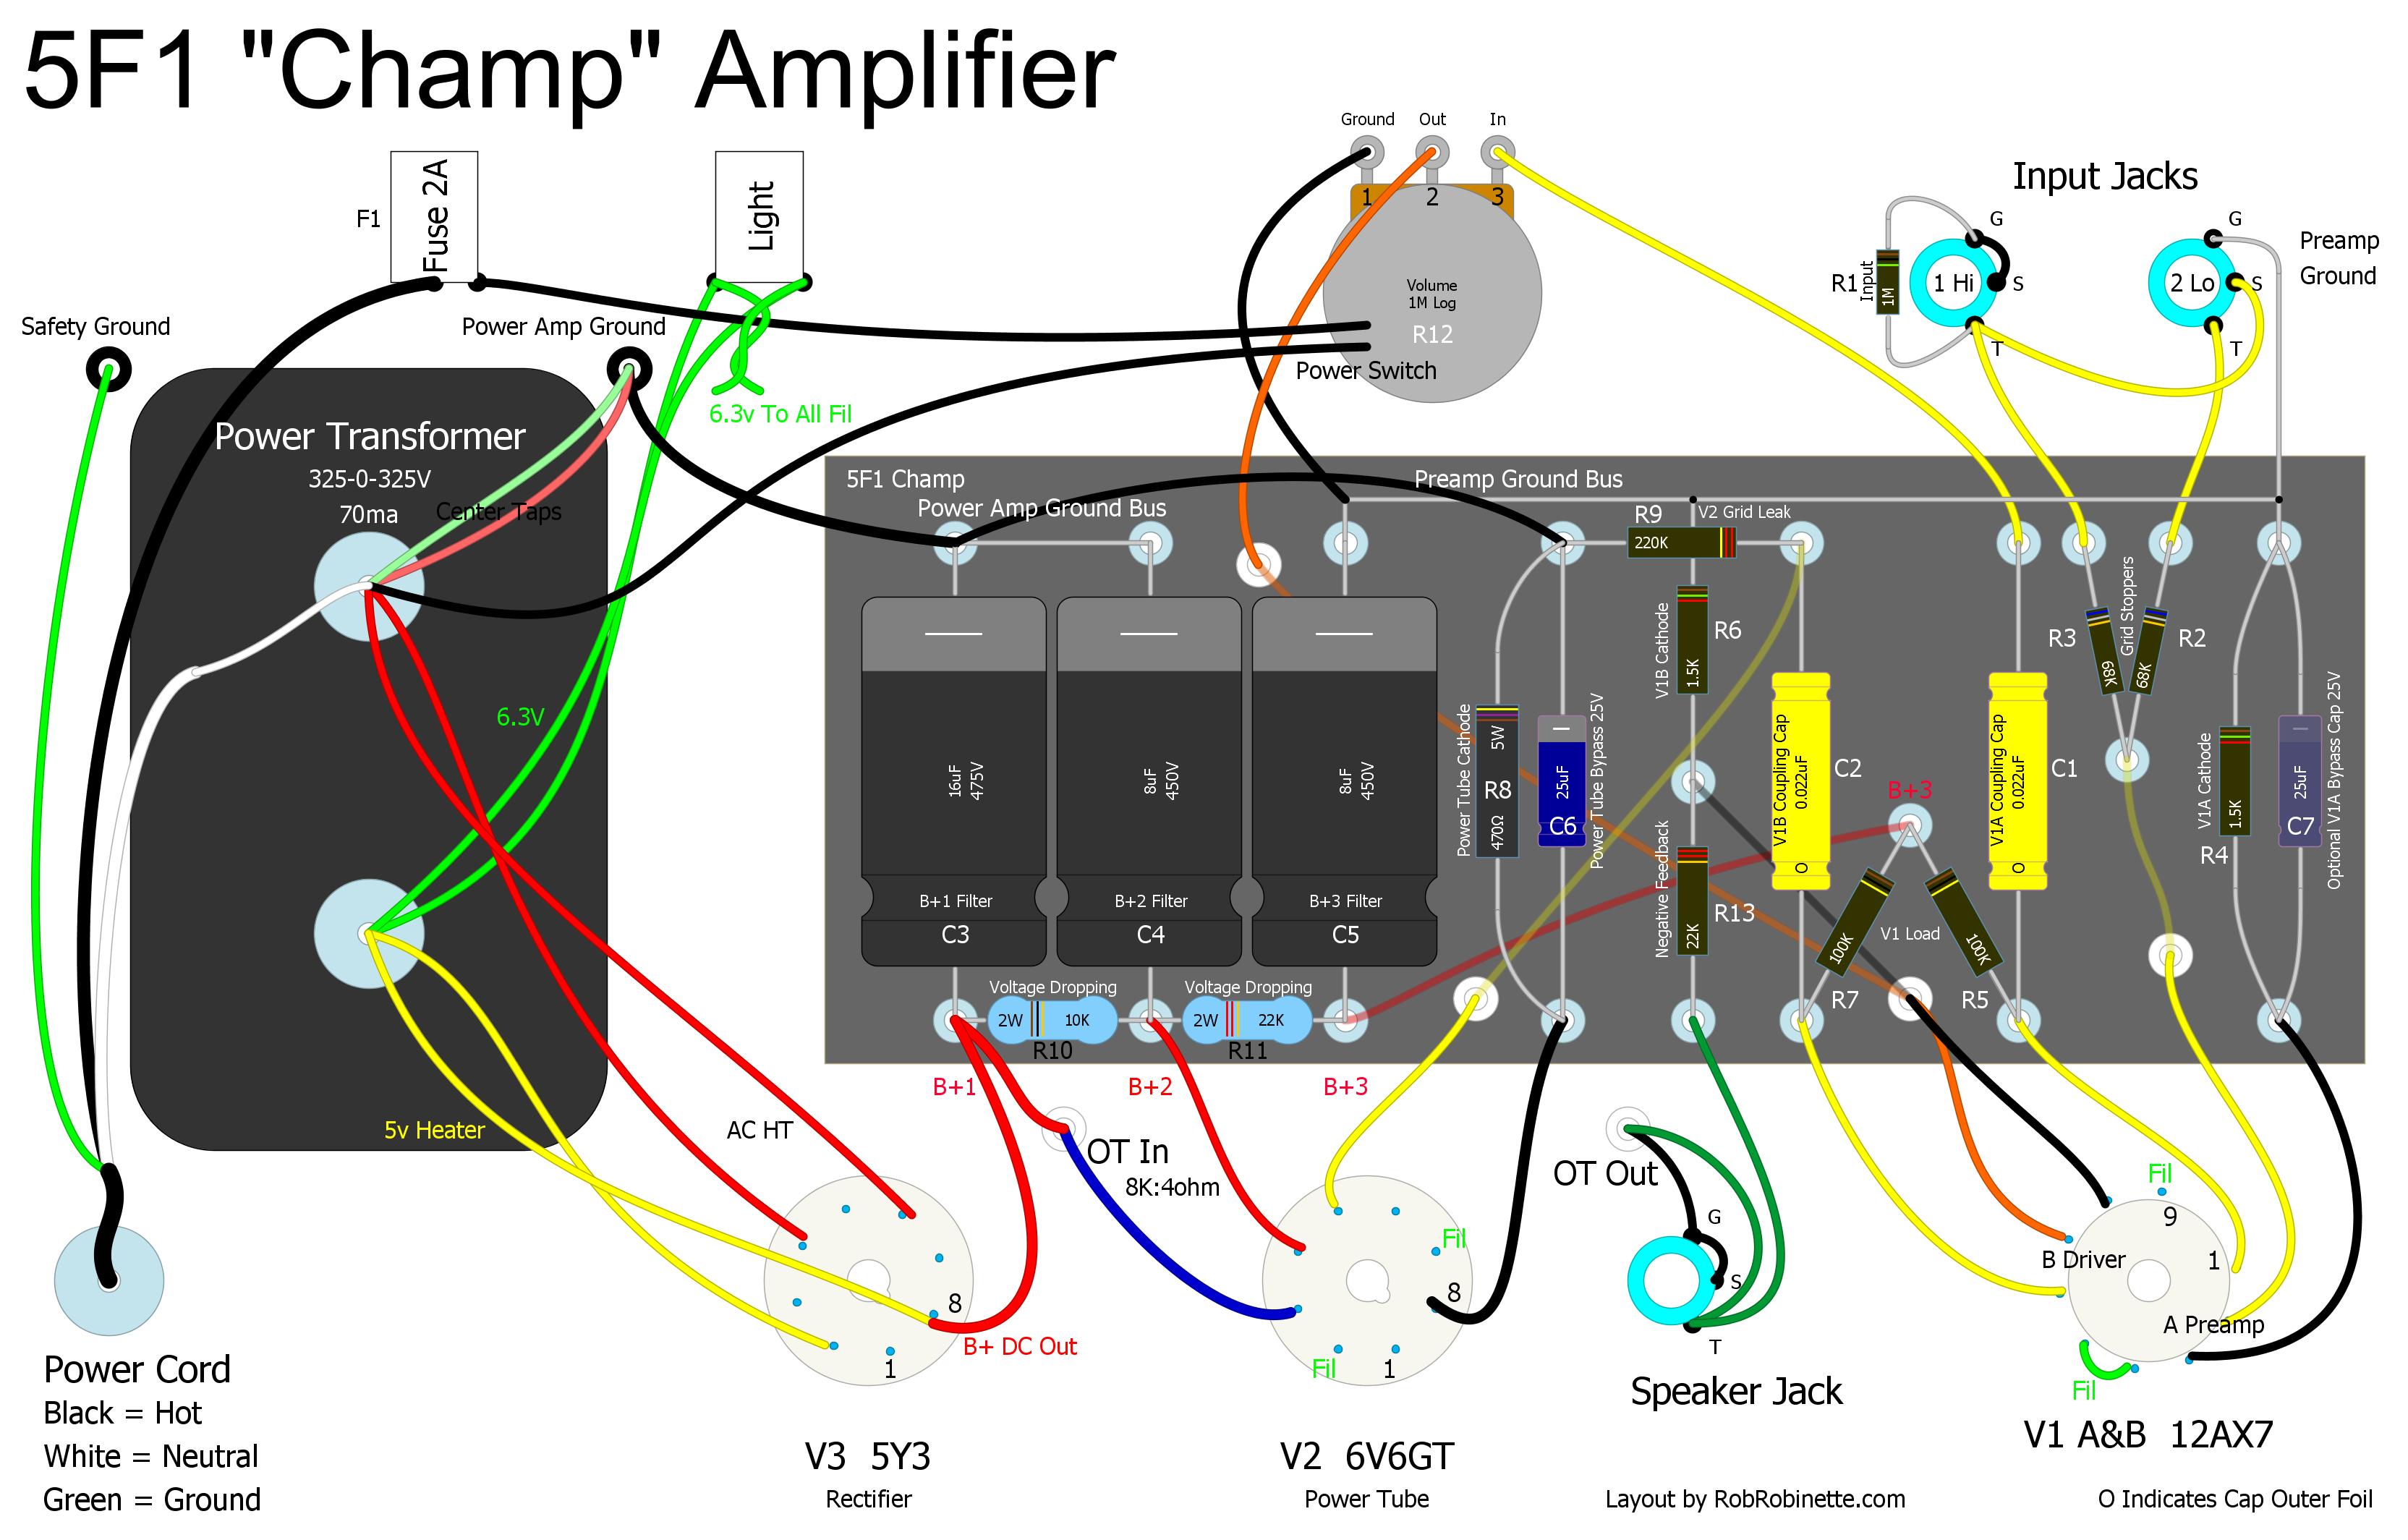 WH_9910] Guitar Amp Wiring Diagram Wiring DiagramPiot Leona Aeocy Sapebe Inama Mohammedshrine Librar Wiring 101